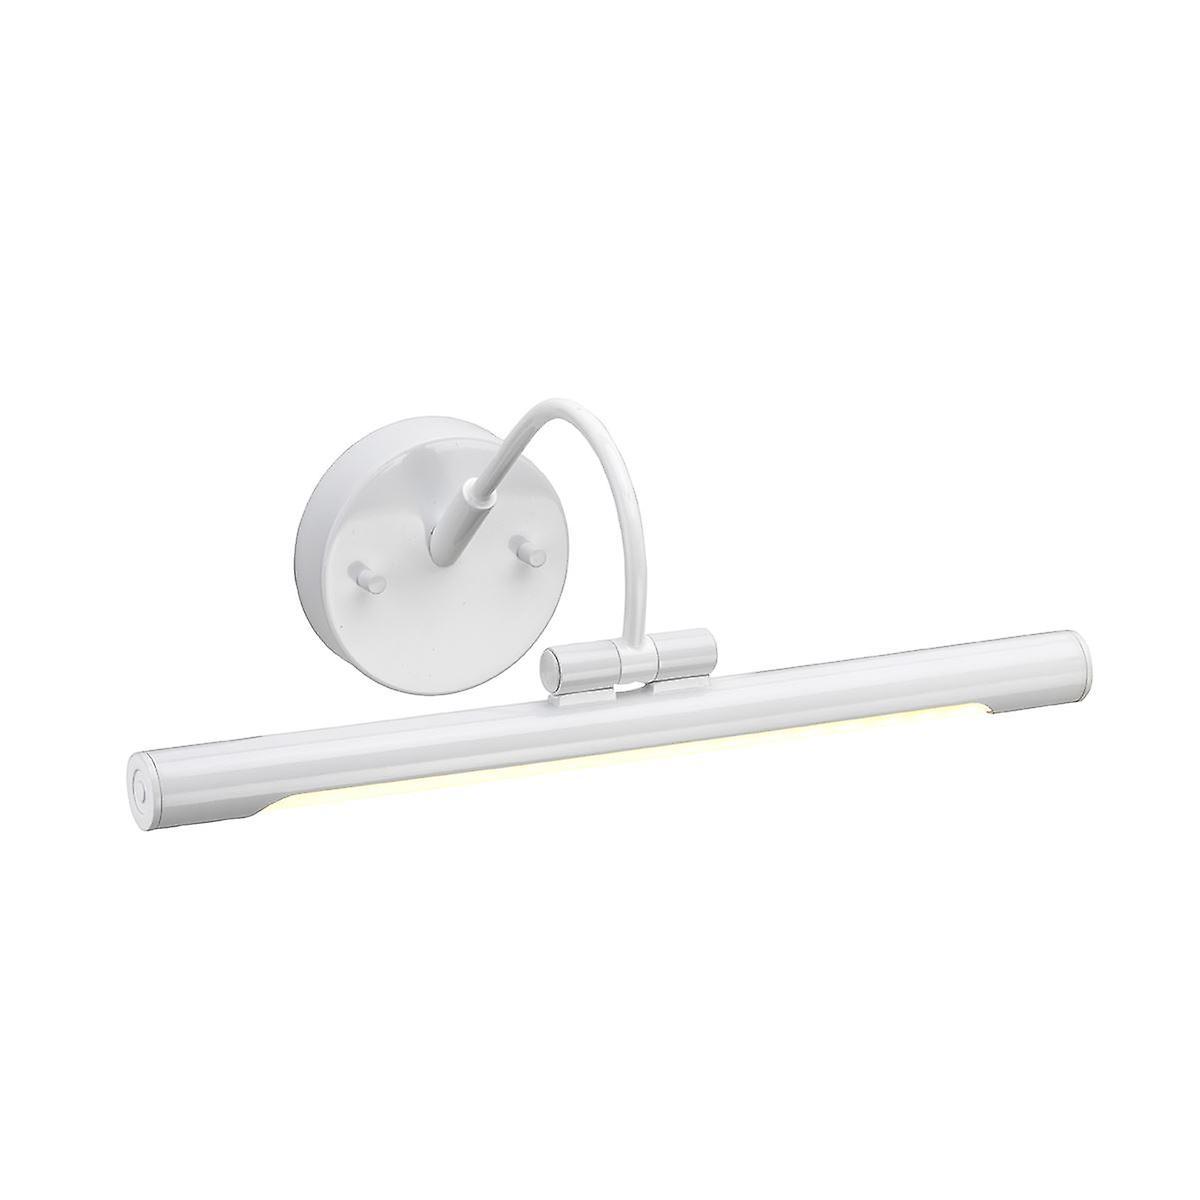 Elstead - 1 Light Small LED Picture Light - blanc - ALTON PL S WHT